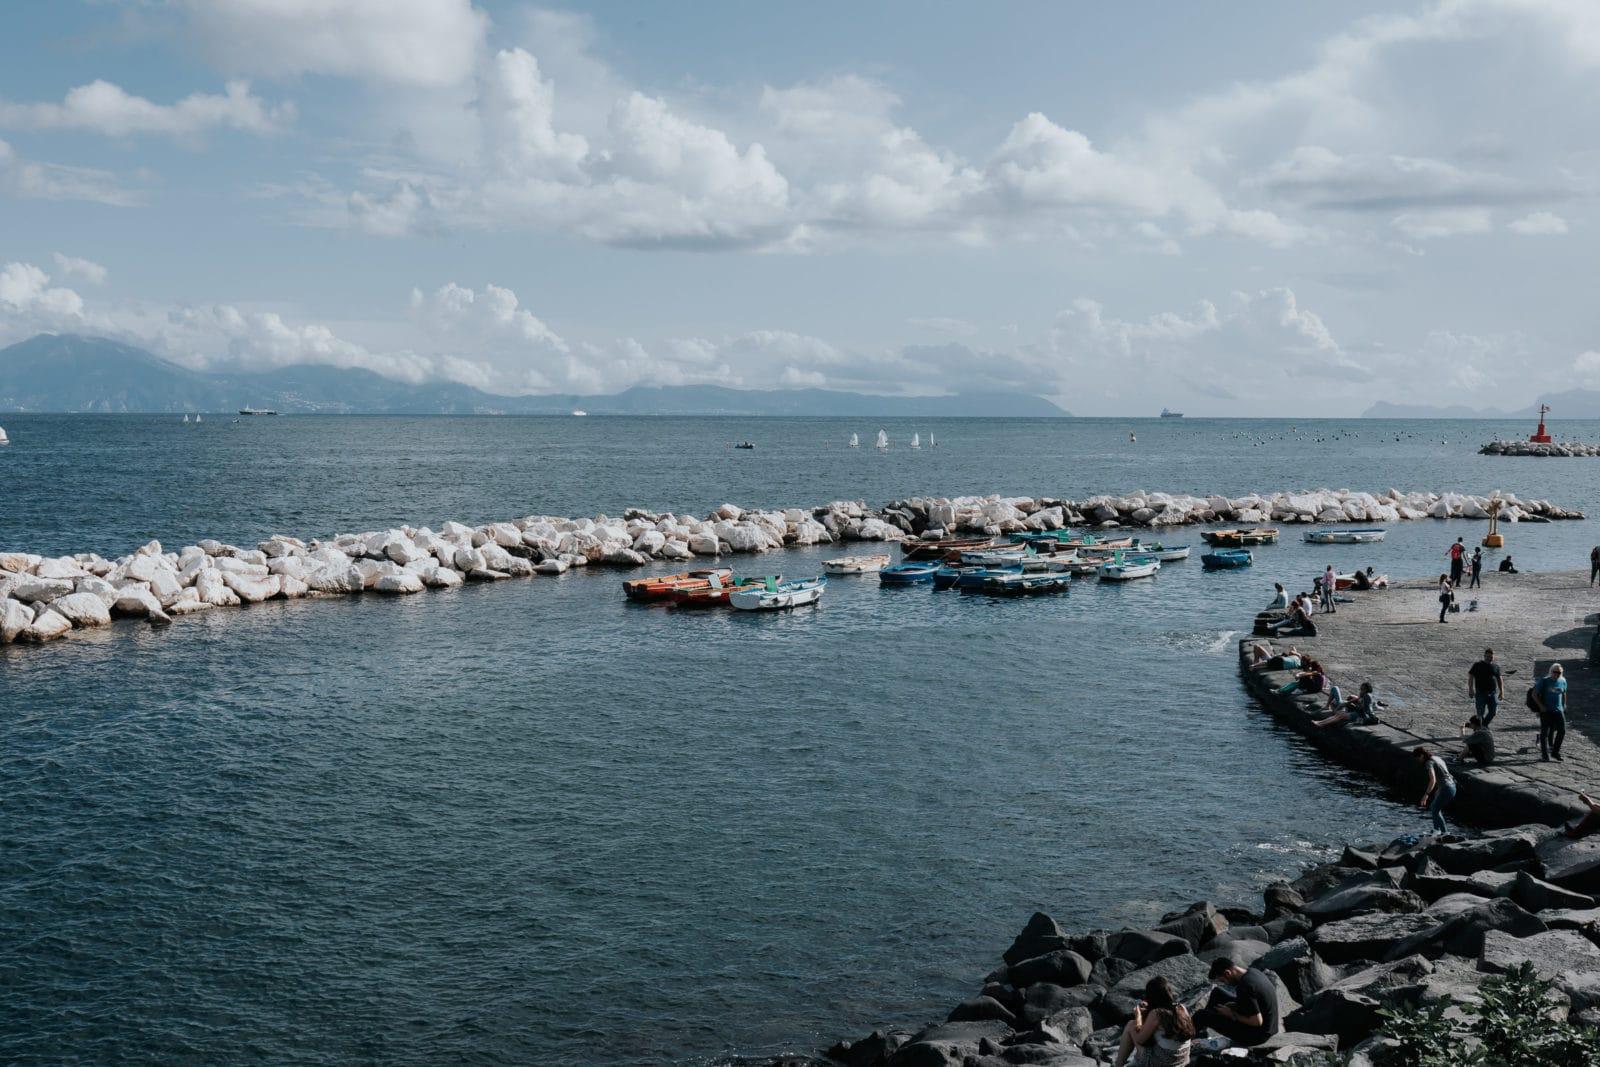 Neapel Sehenswürdigkeiten Promenade